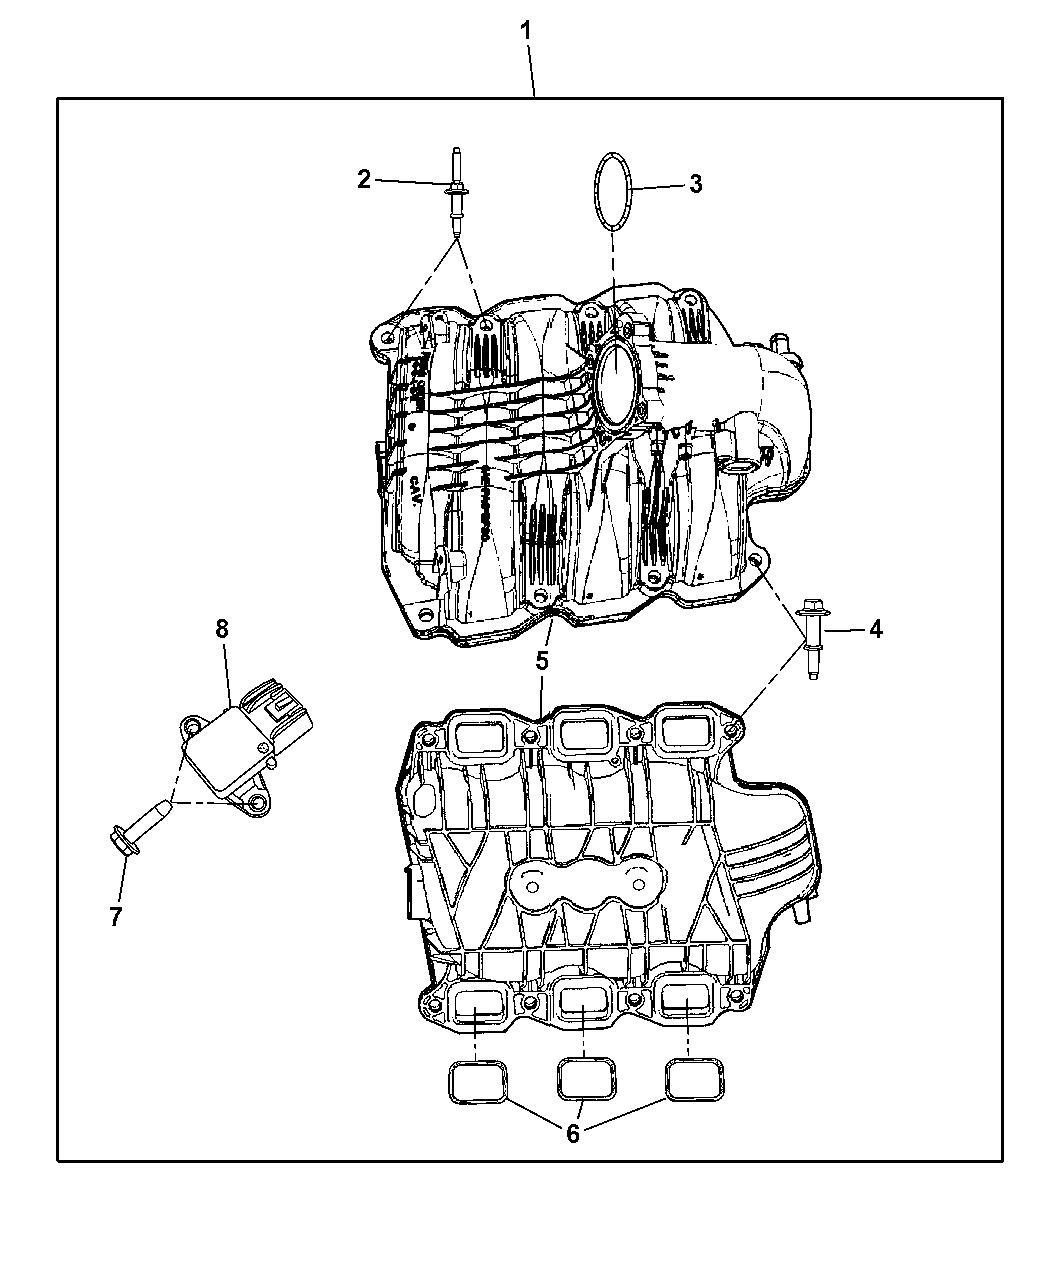 2011 Dodge Nitro Intake Manifold - Thumbnail 1